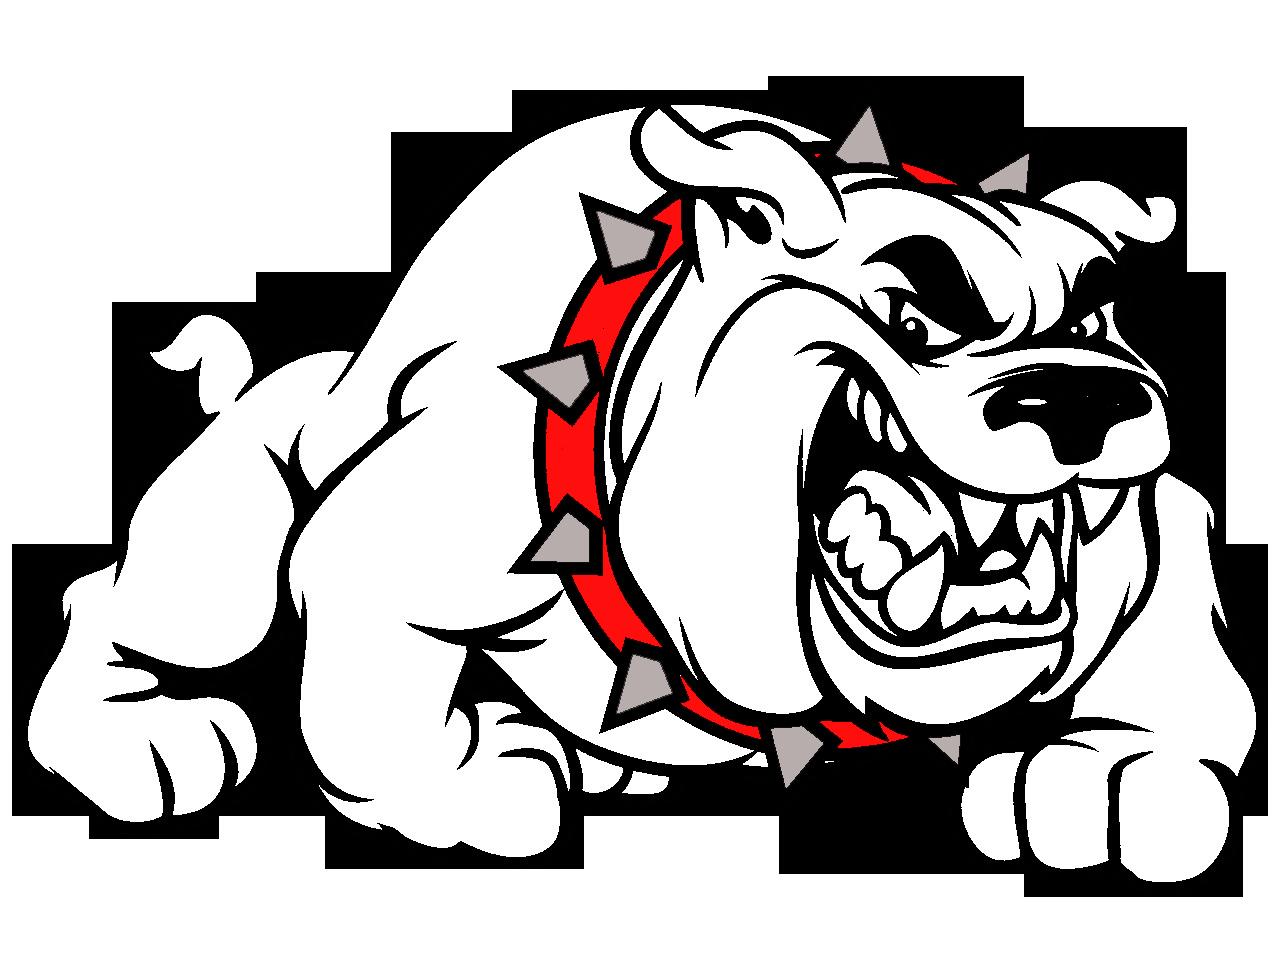 Free Free Bulldog Mascot Clipart, Download Free Clip Art.